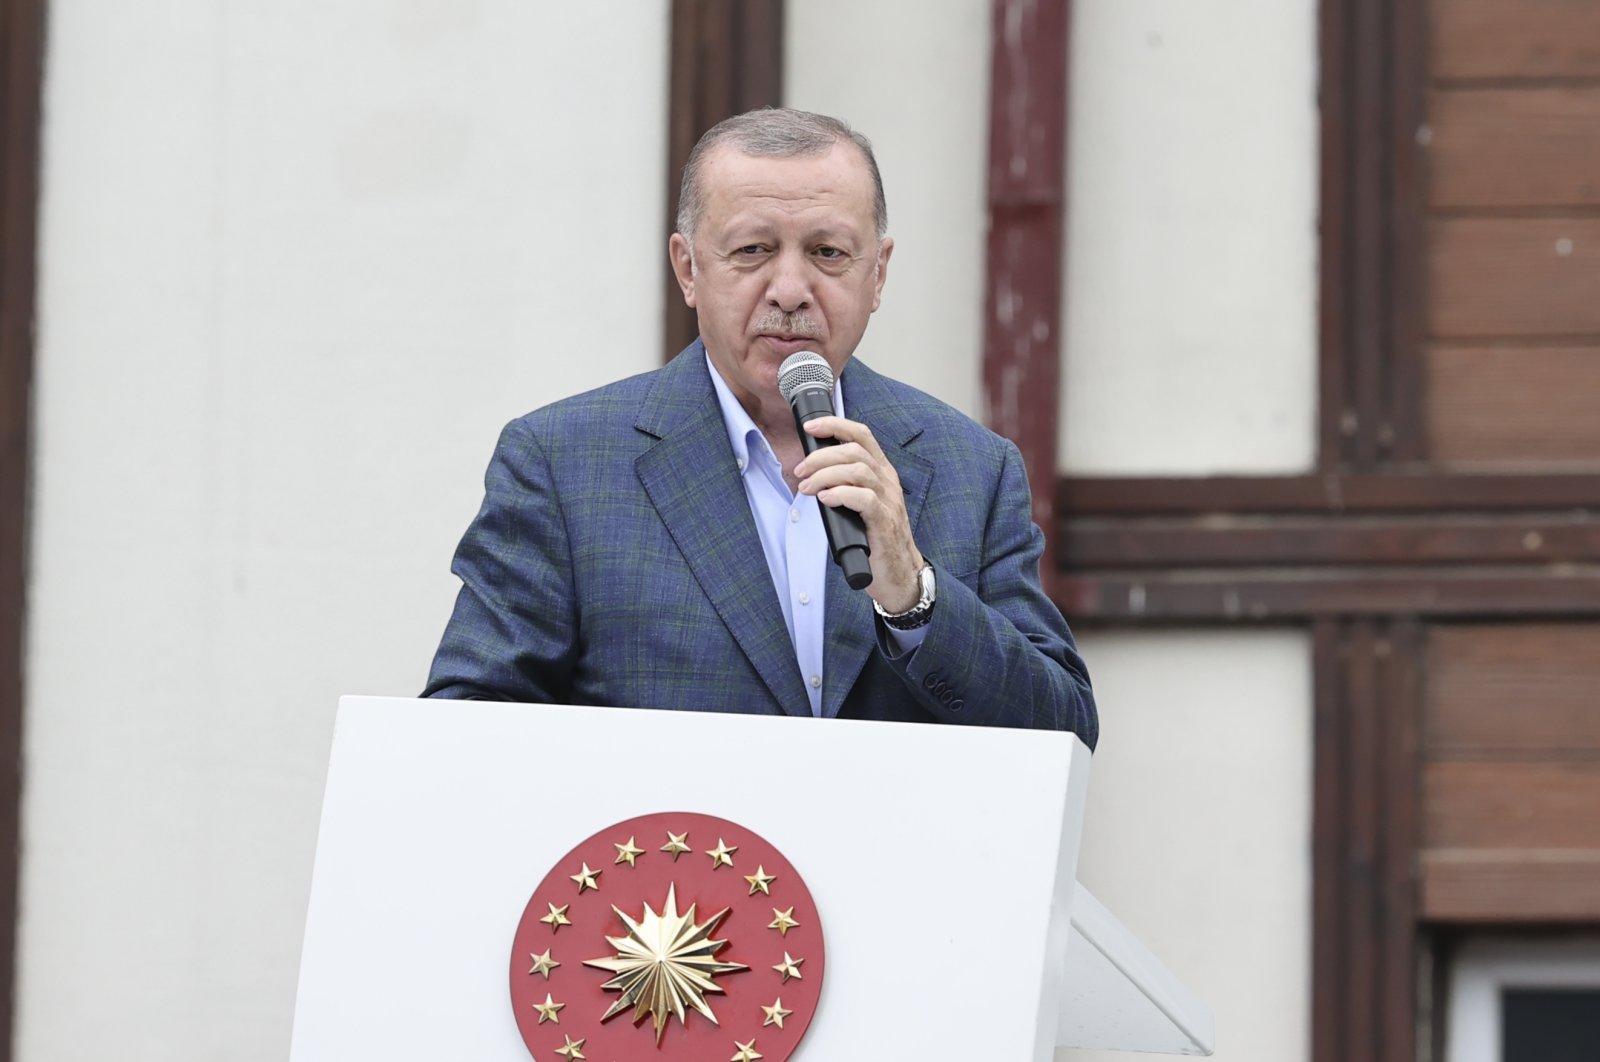 Turkey's President Recep Tayyip Erdoğan speaks during his visit to the flood-stricken northwestern province of Rize, Turkey, July 23, 2021. (AA Photo)